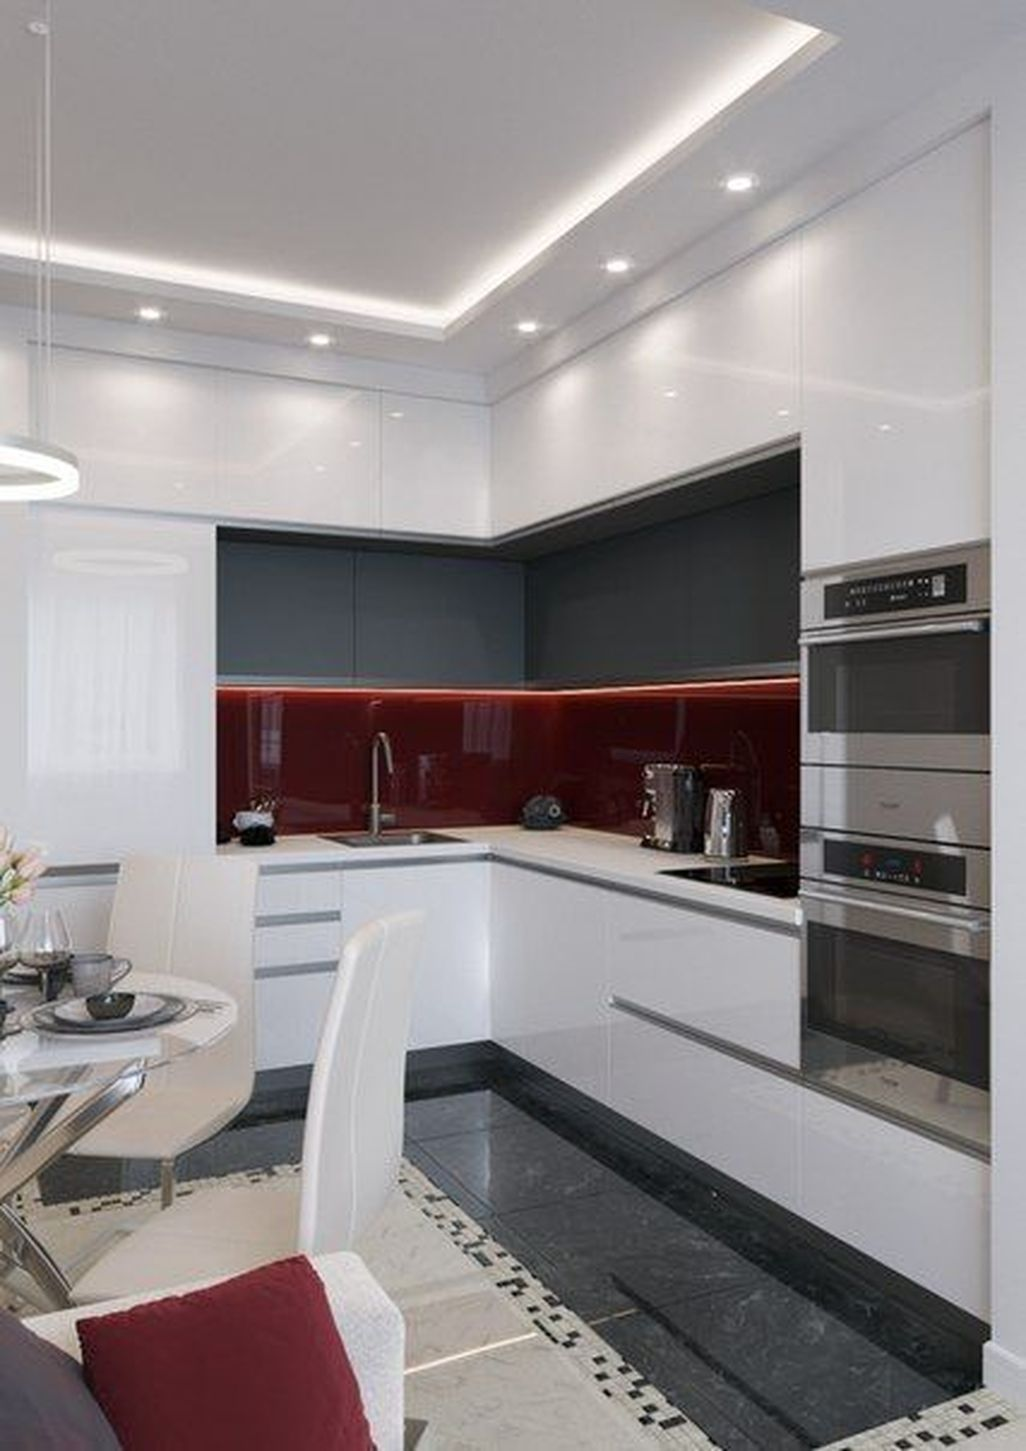 15 Inspiring Small Kitchen Remodel Design Ideas  Cuisine moderne